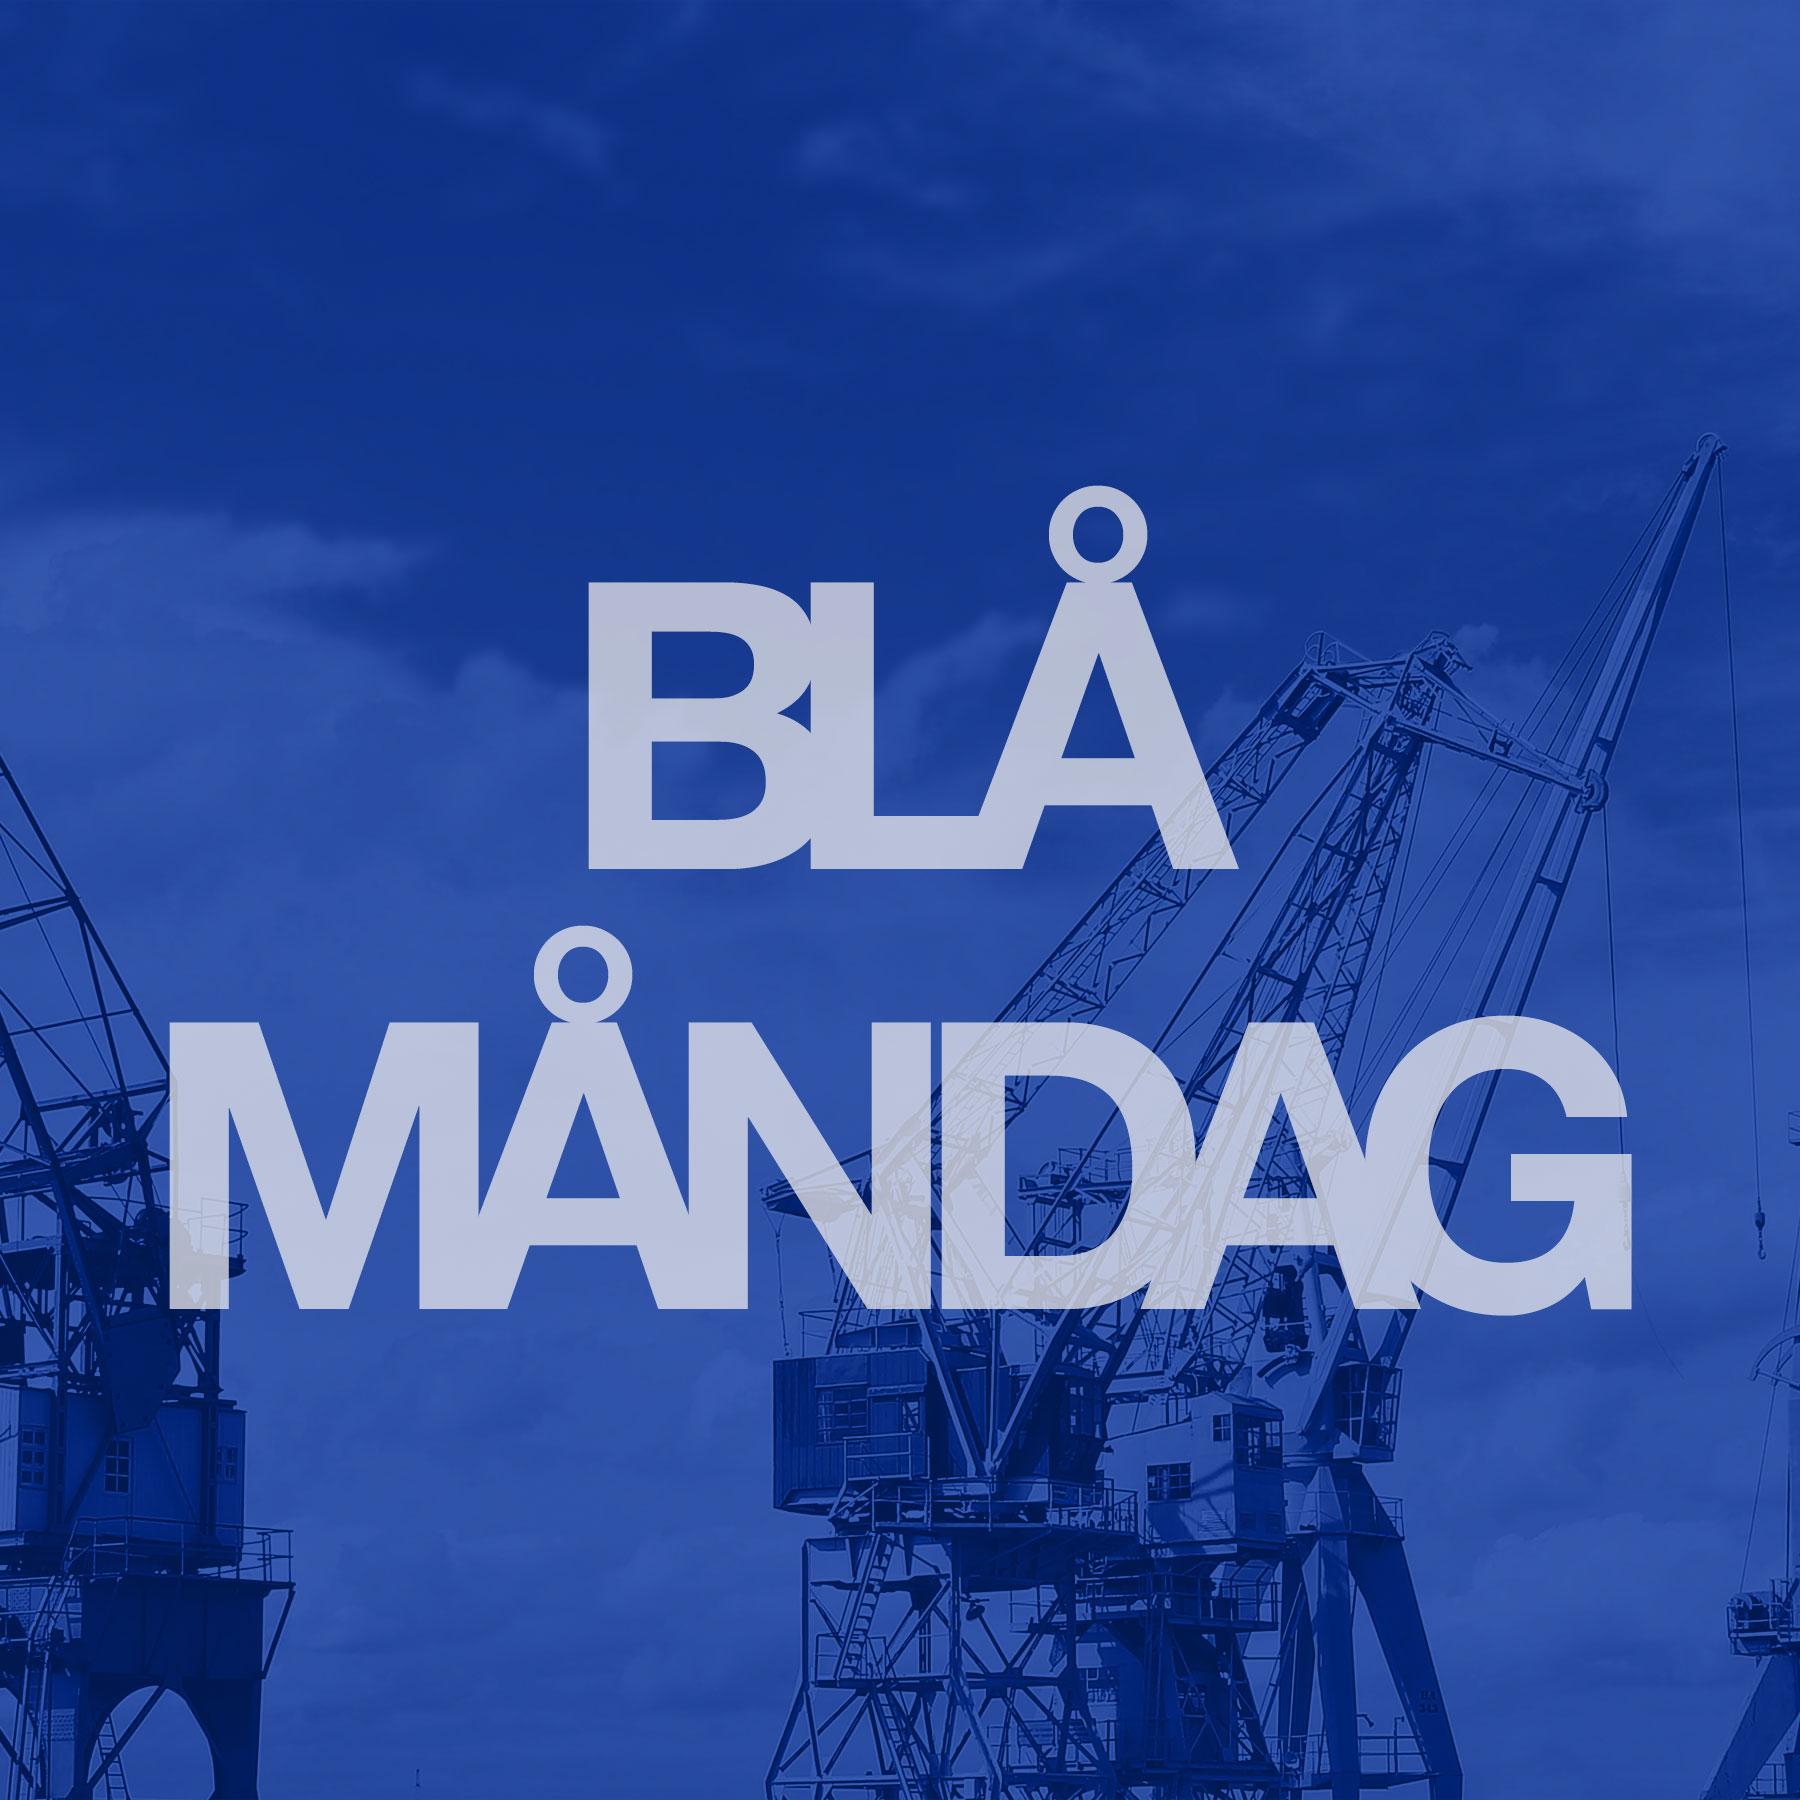 Blå måndag show art